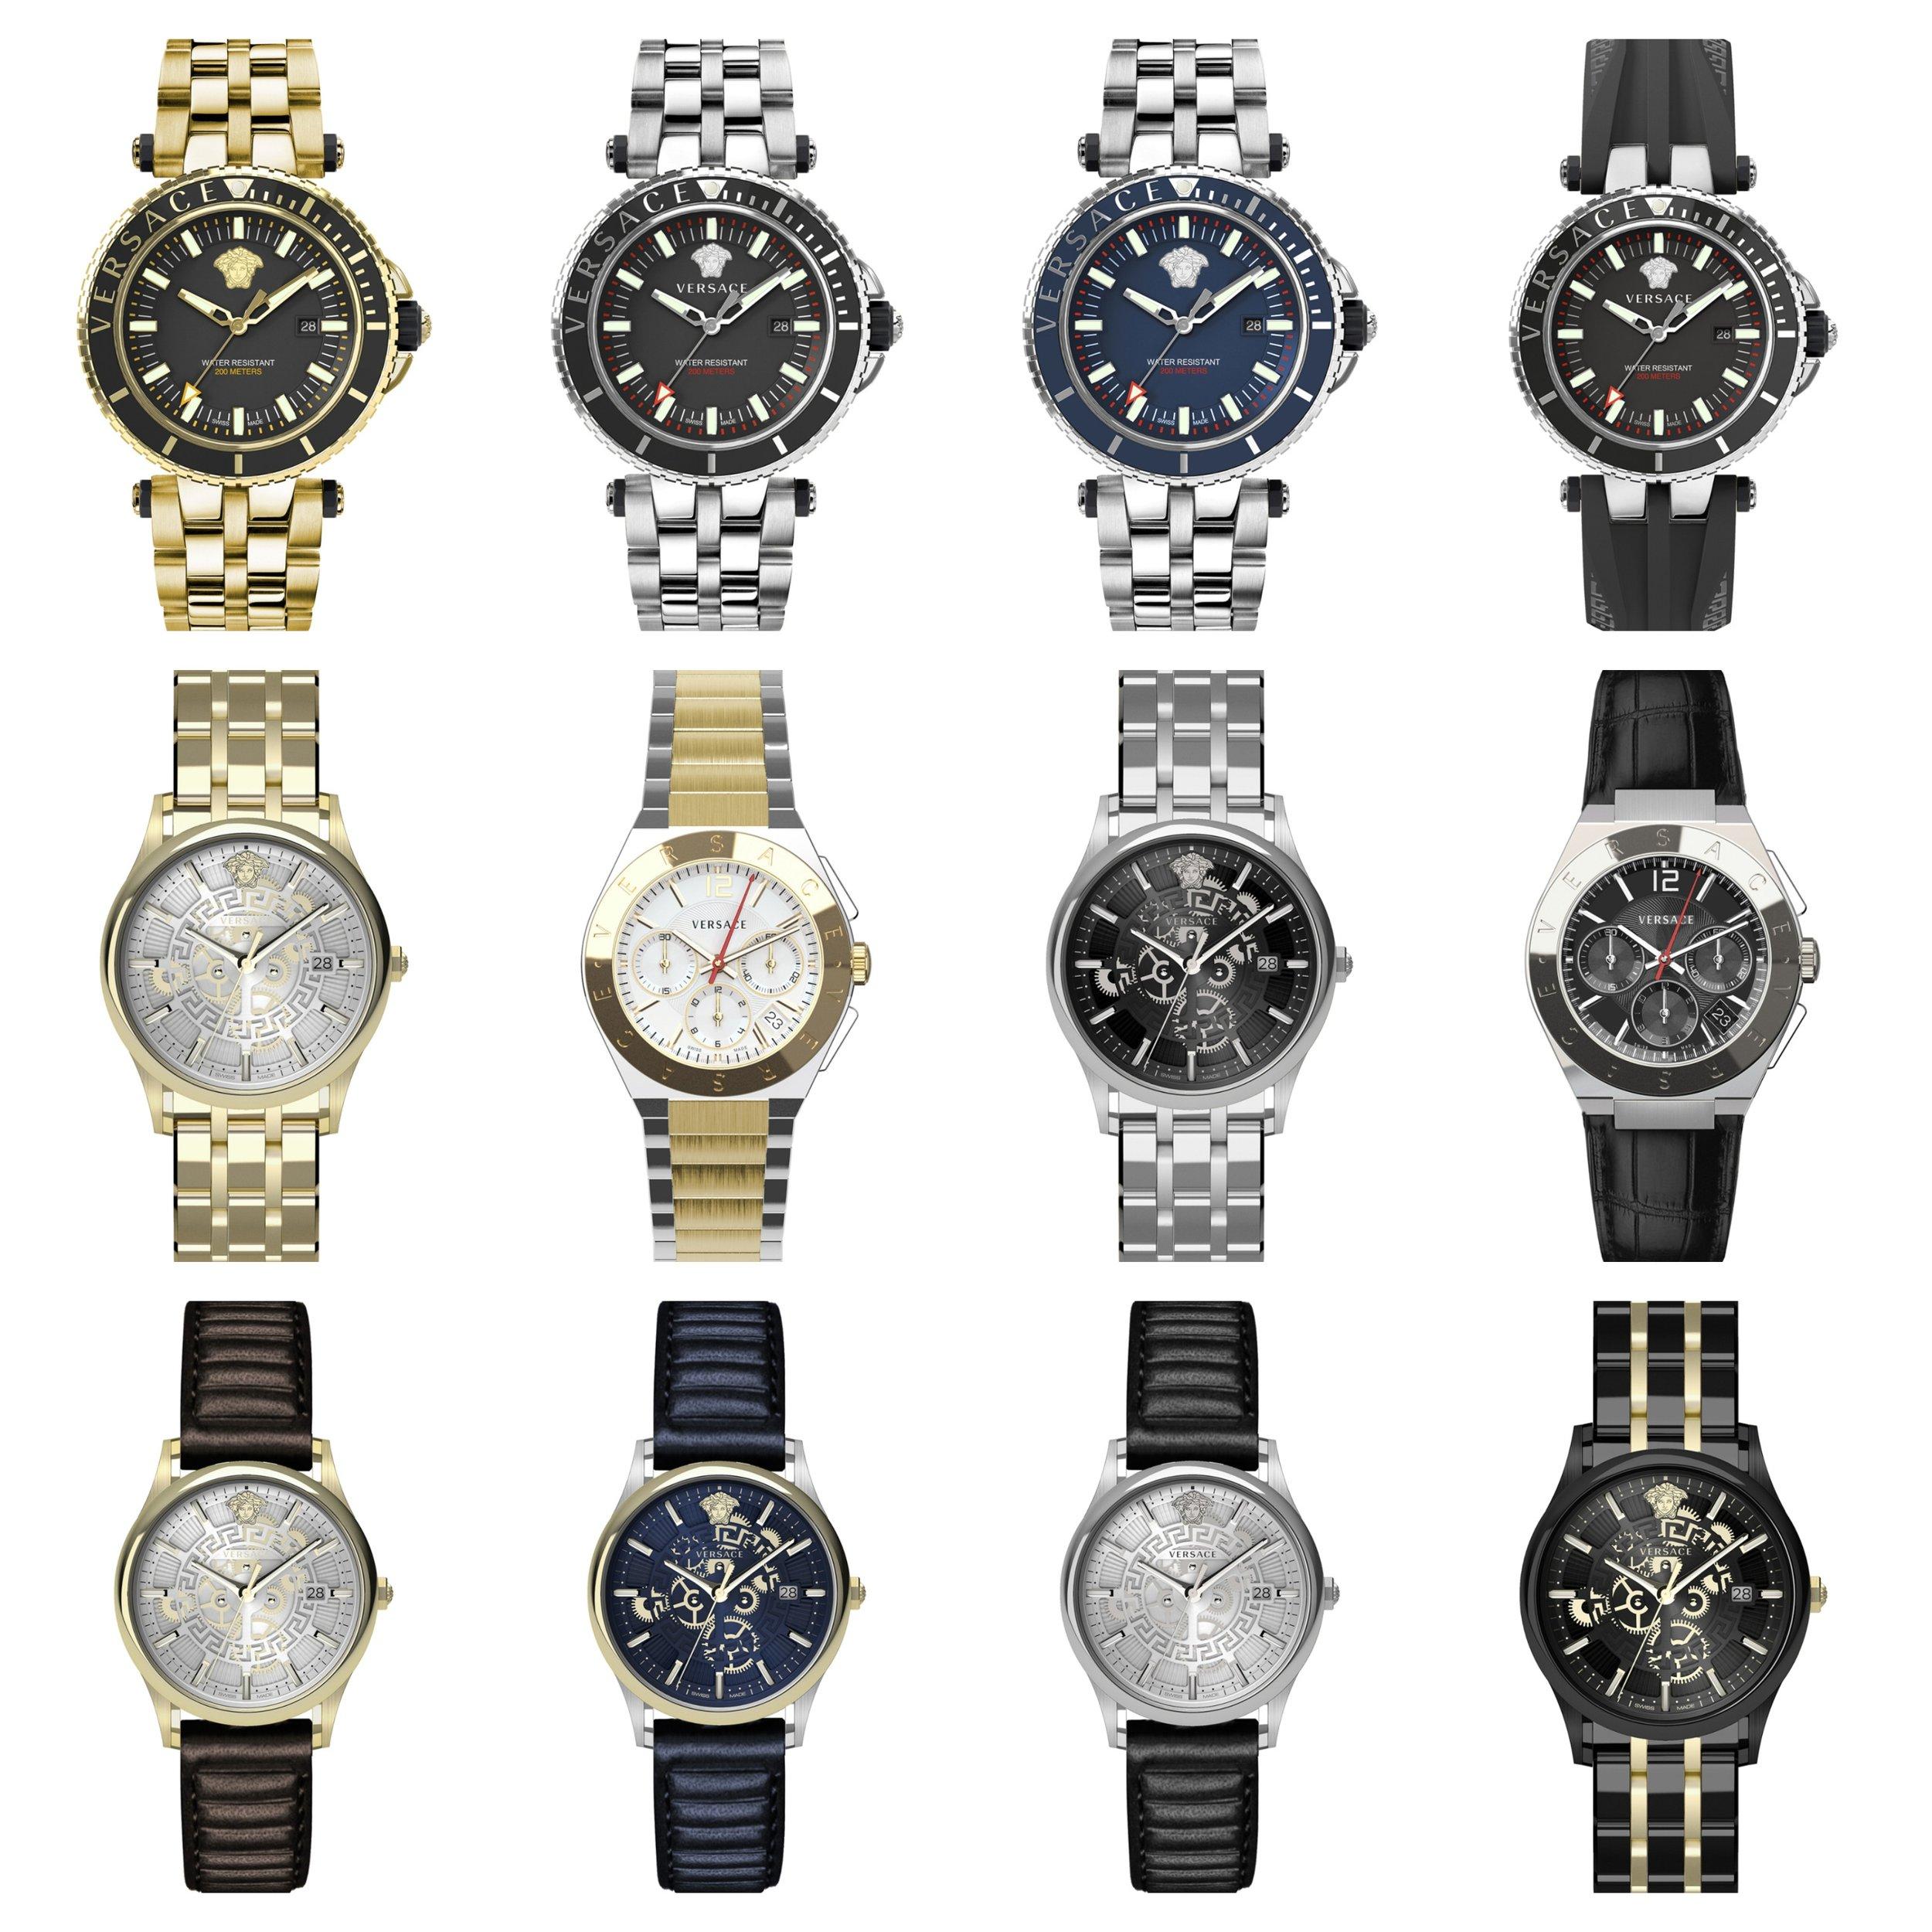 Versace-Watches.jpg